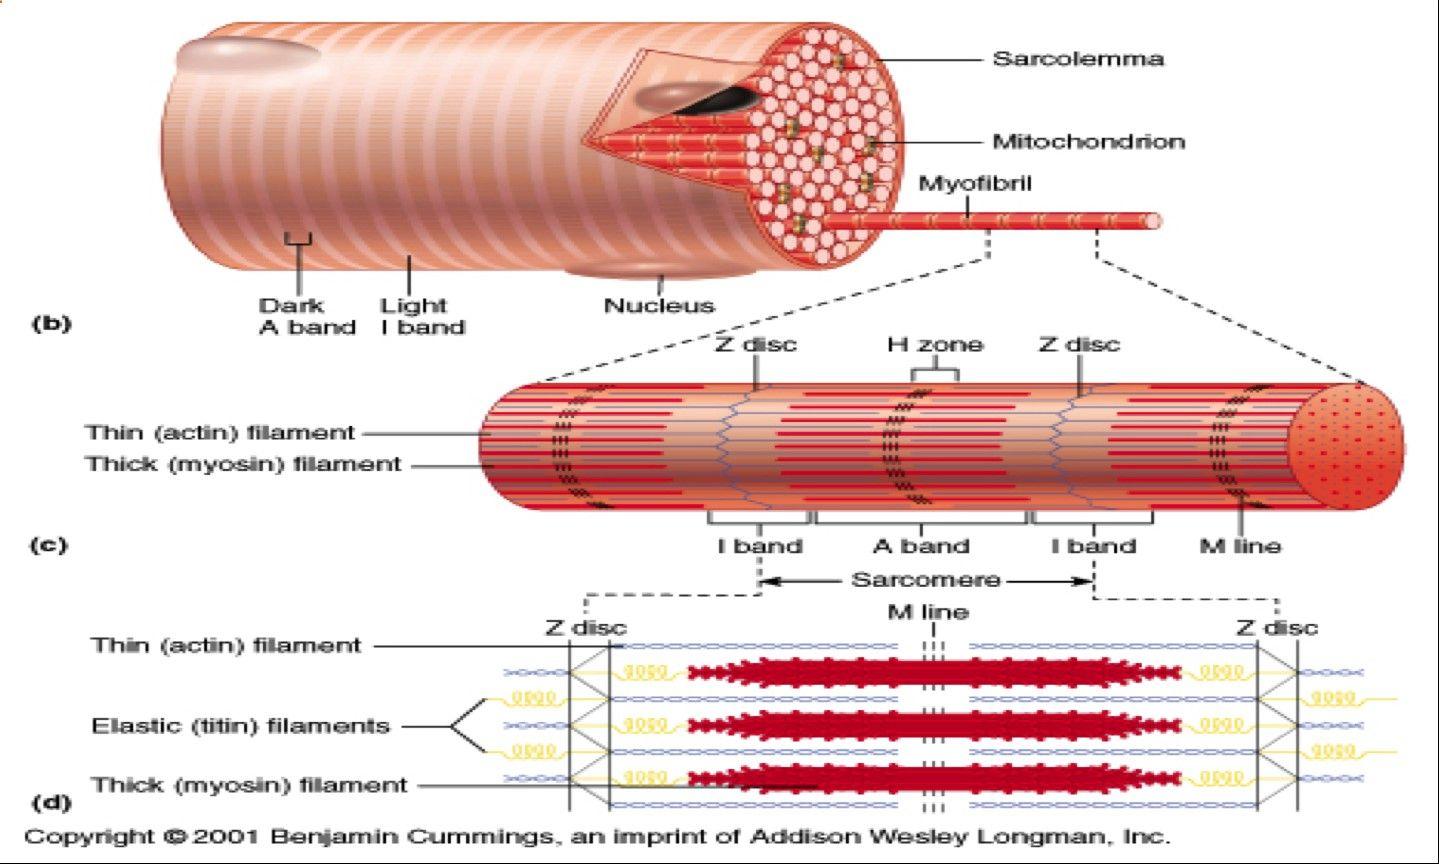 skeletal muscle fiber labeled - Google Search   Skeletal ...